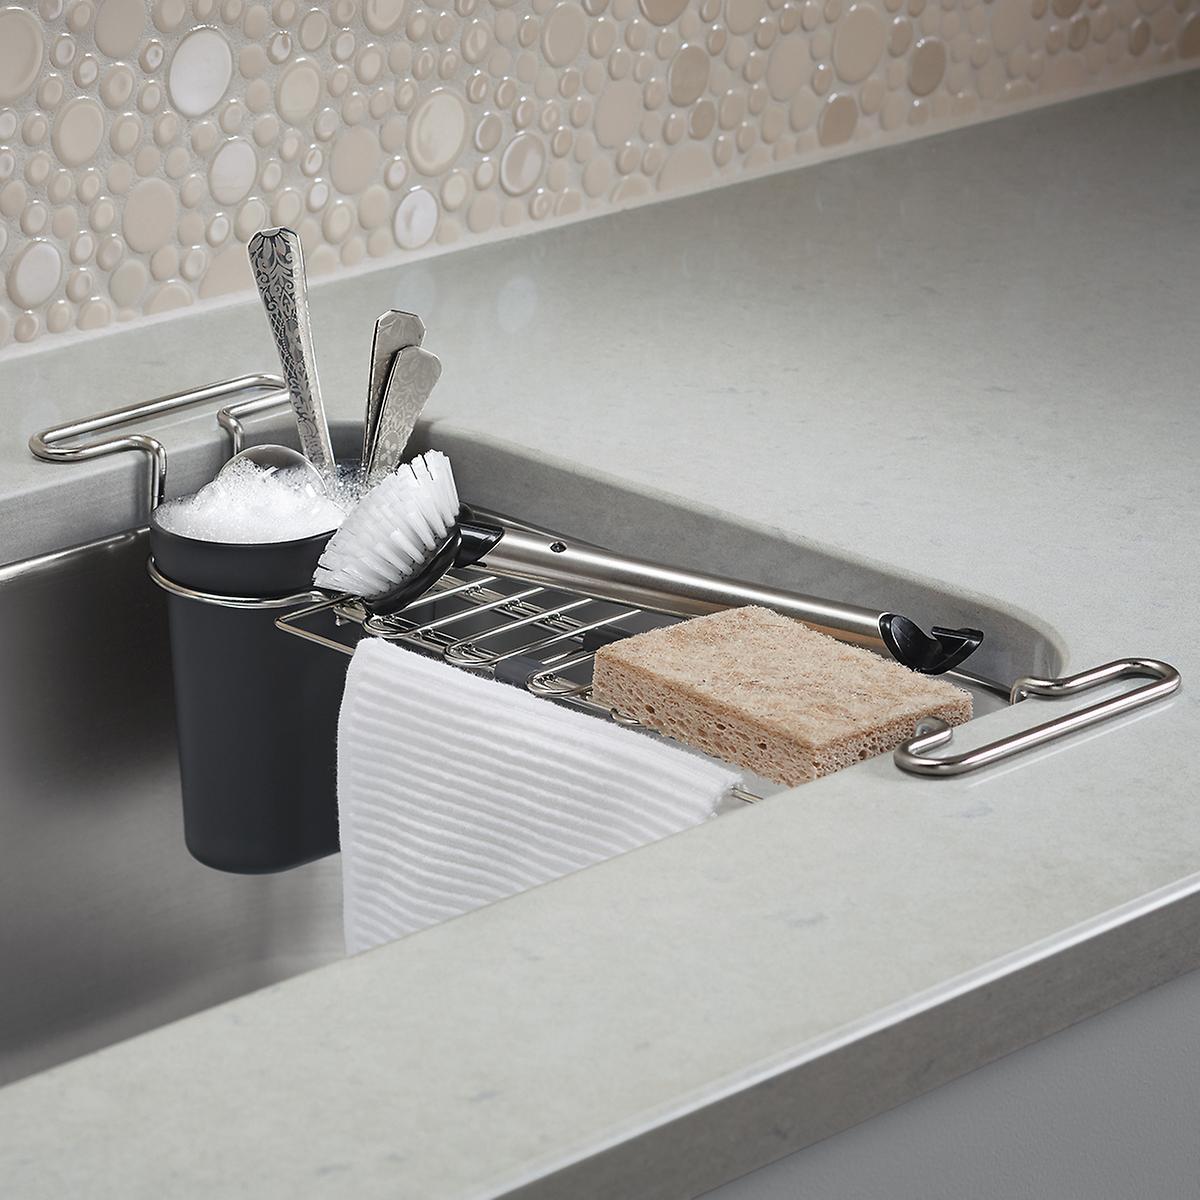 Kohler Chrome Kitchen Sink Utility Rack The Container Store